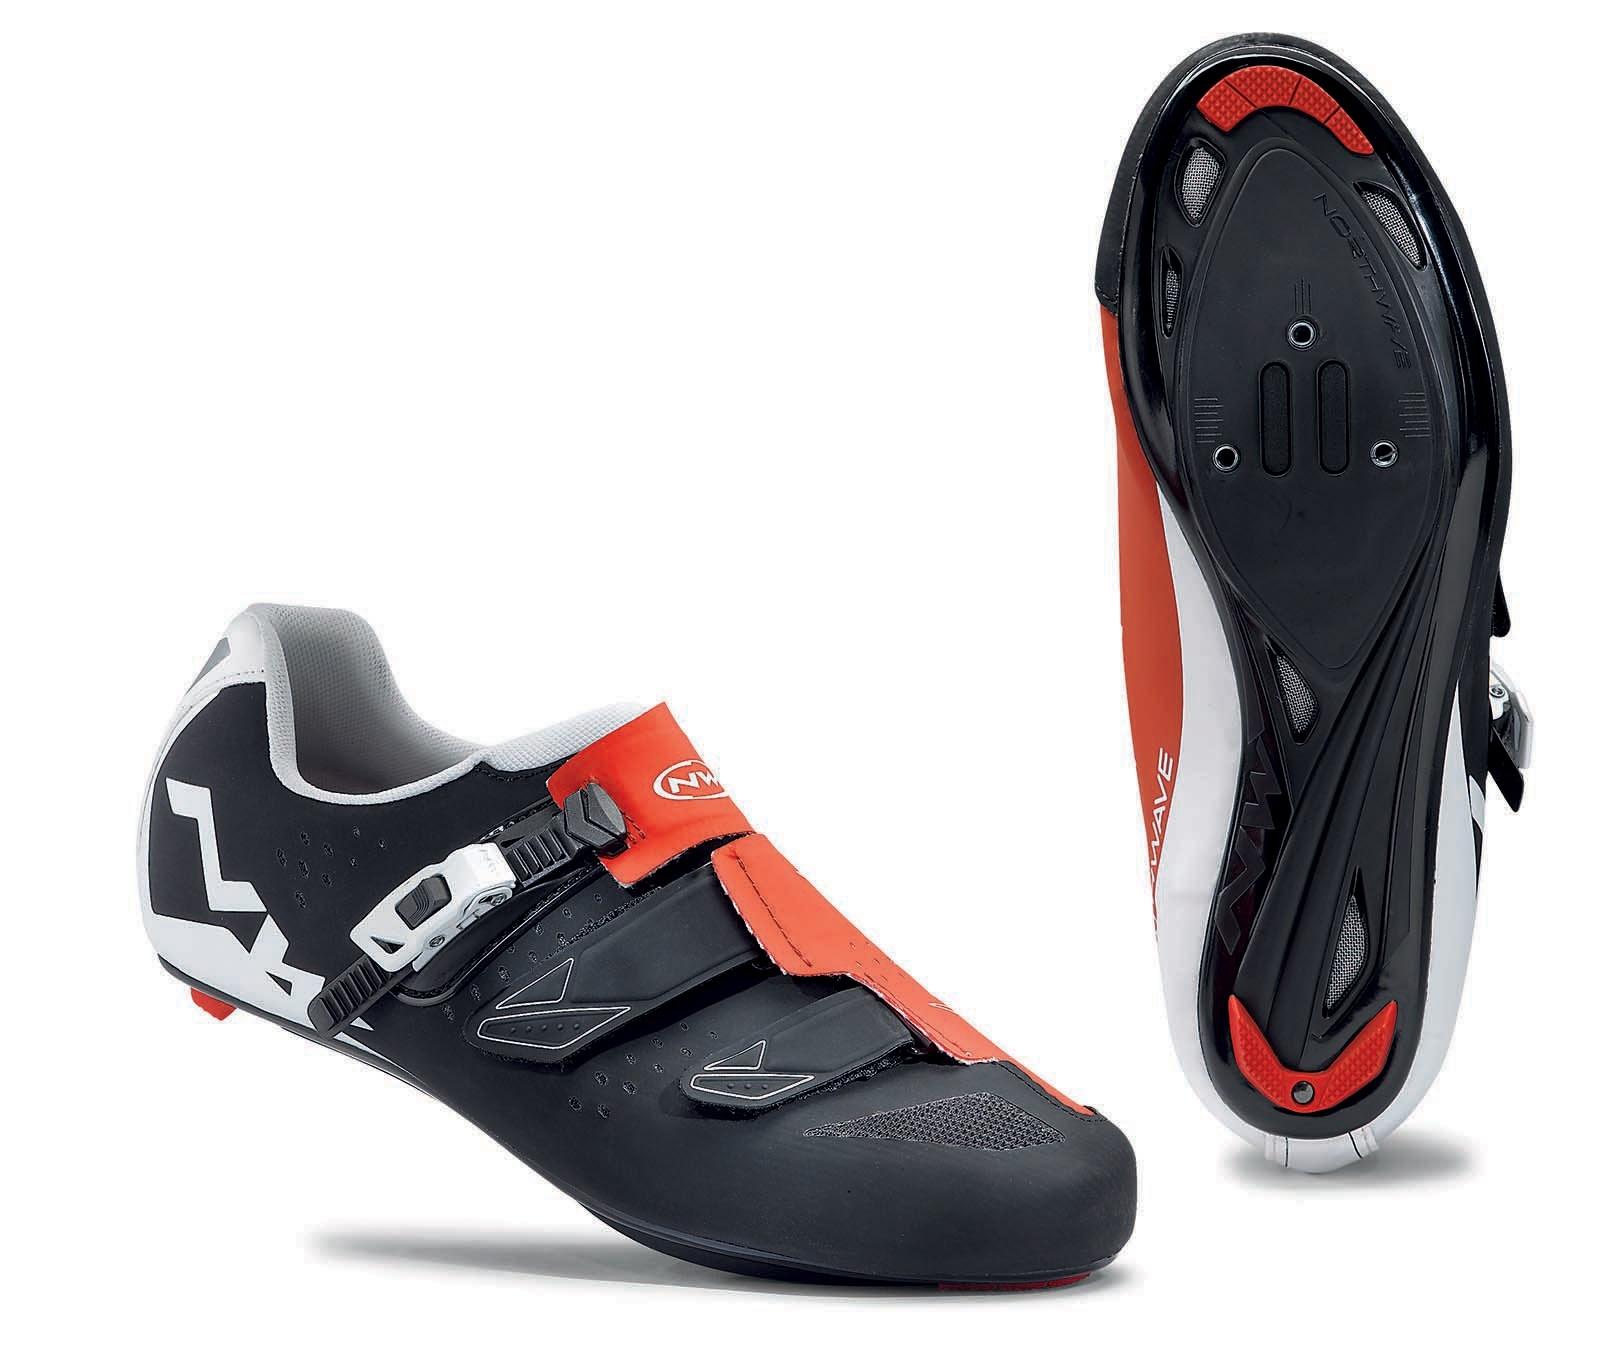 Best price Northwave Man road shoes PHANTOM SRS Italy2us.com